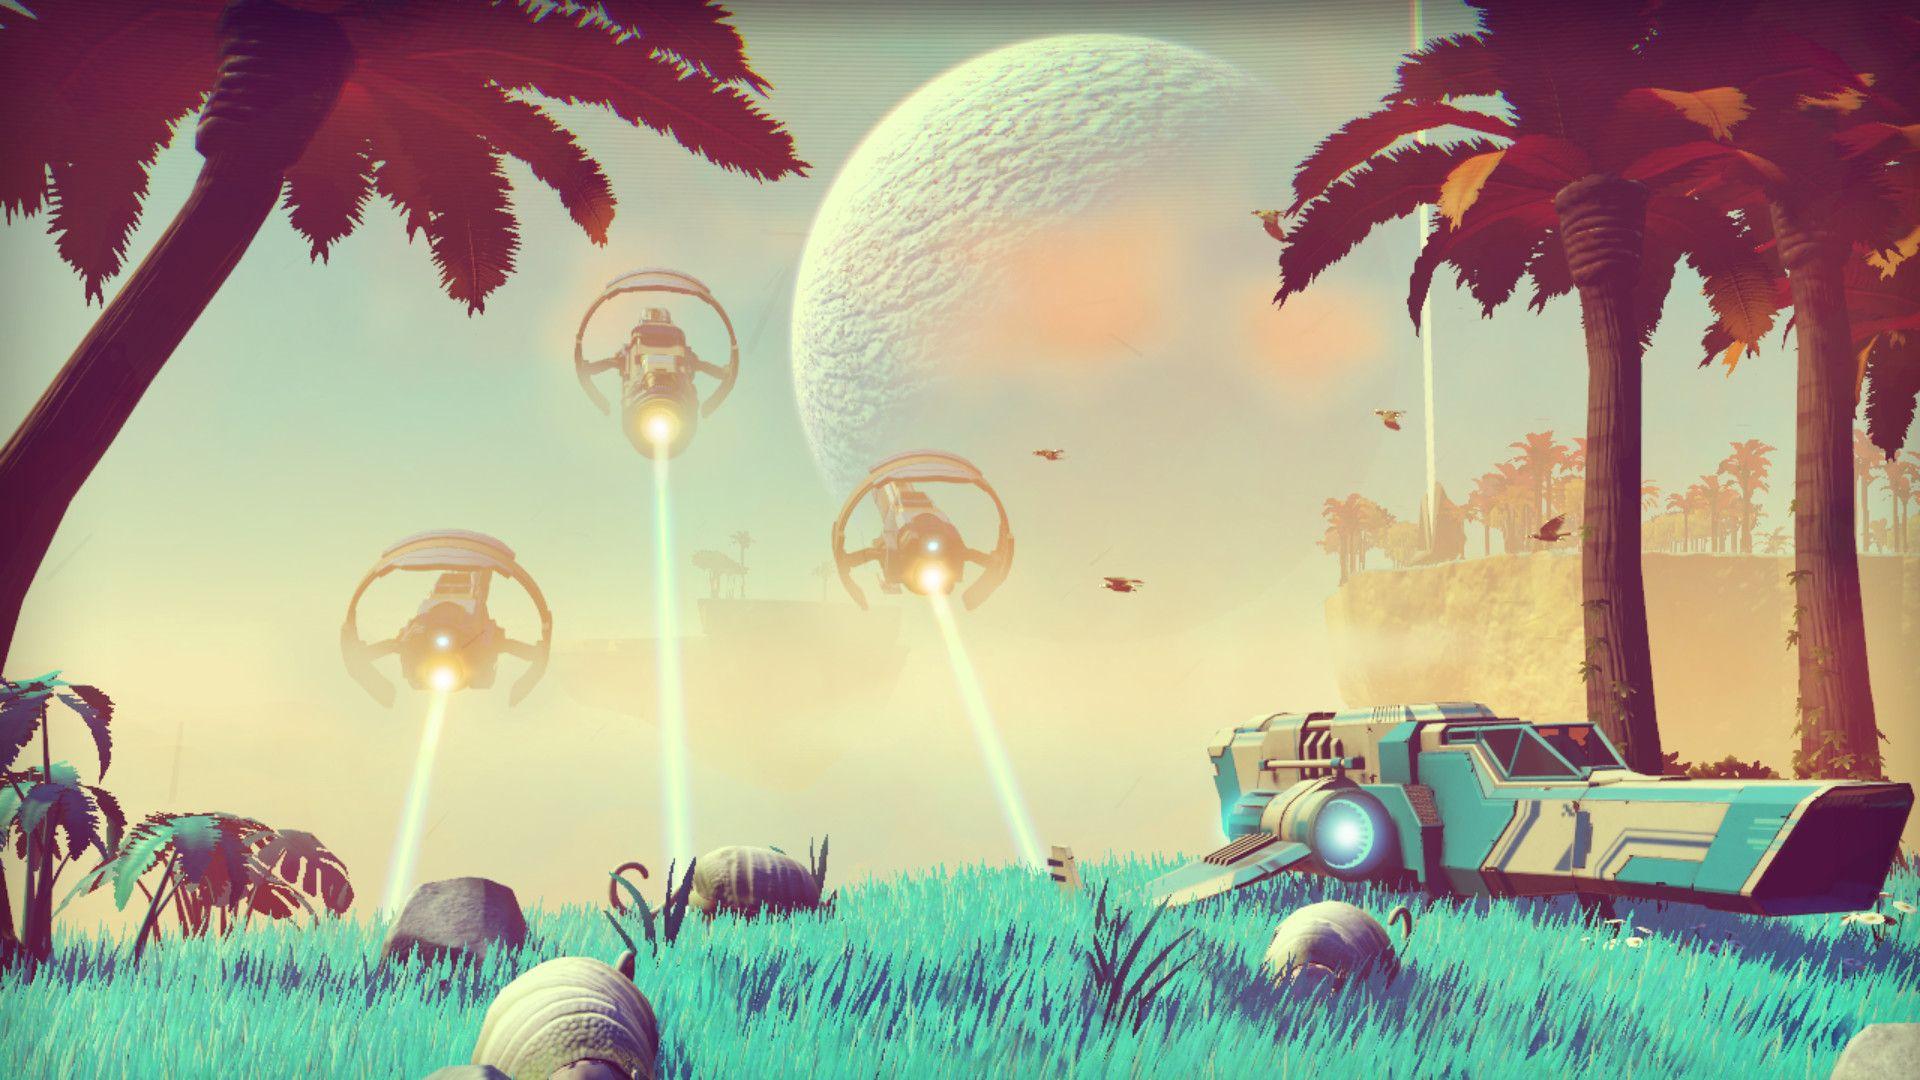 No Man's Sky: Erstes Update fertiggestellt – Werden die Bugs behoben?